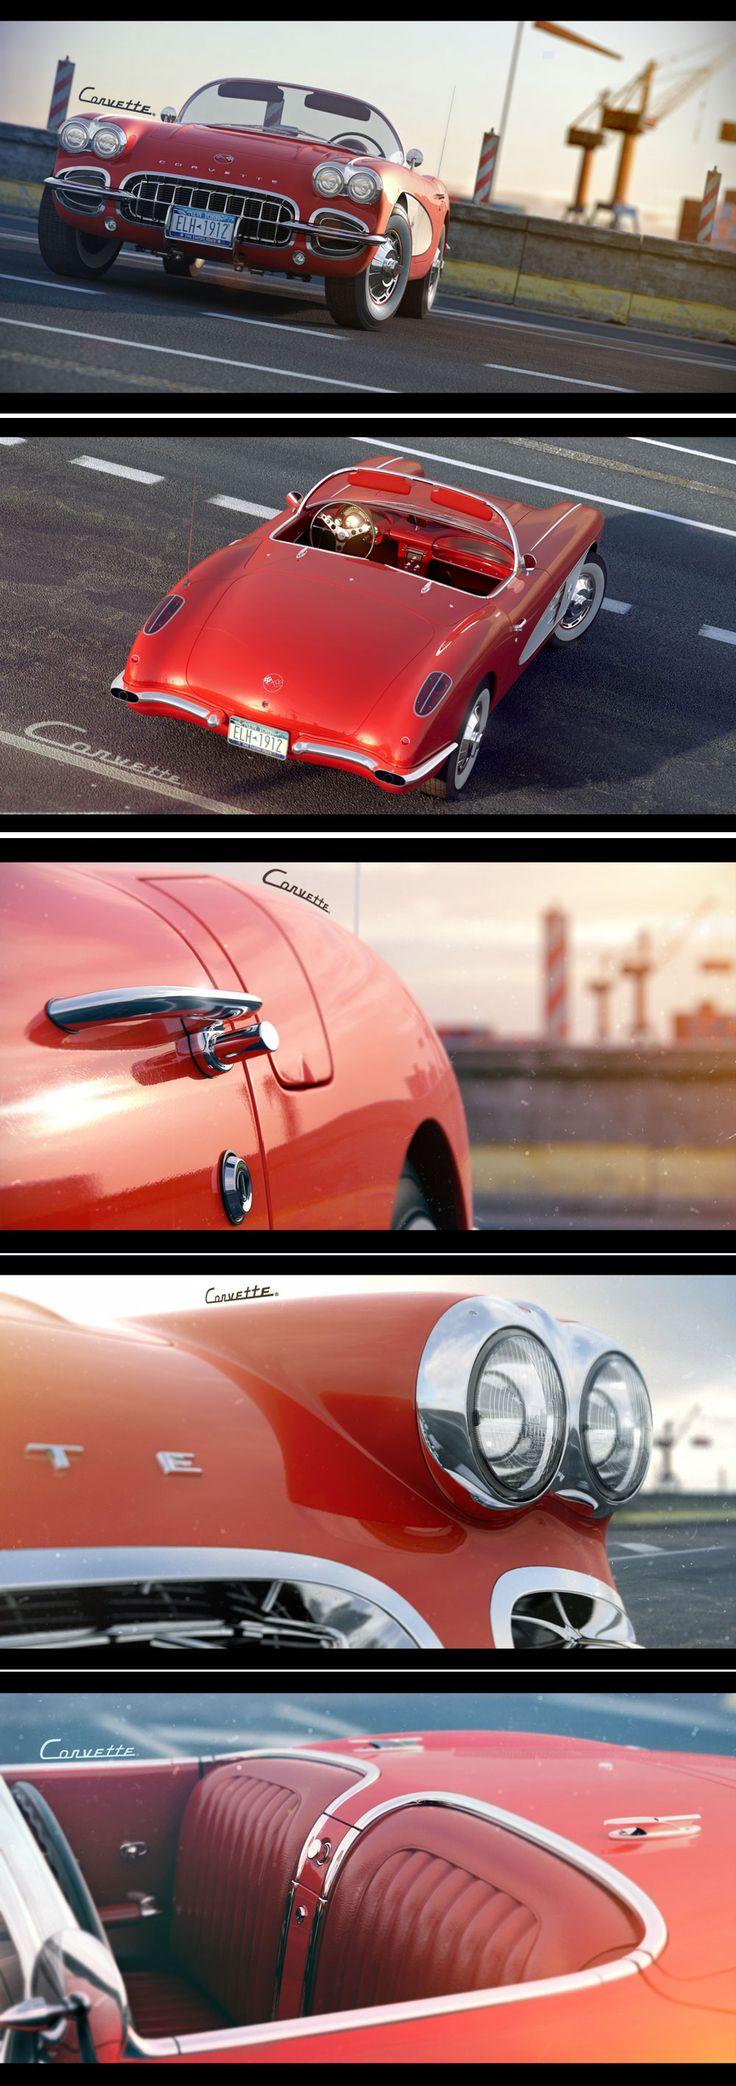 Corvette. Add a luggage rack, and I'll take it! Just sayin'......